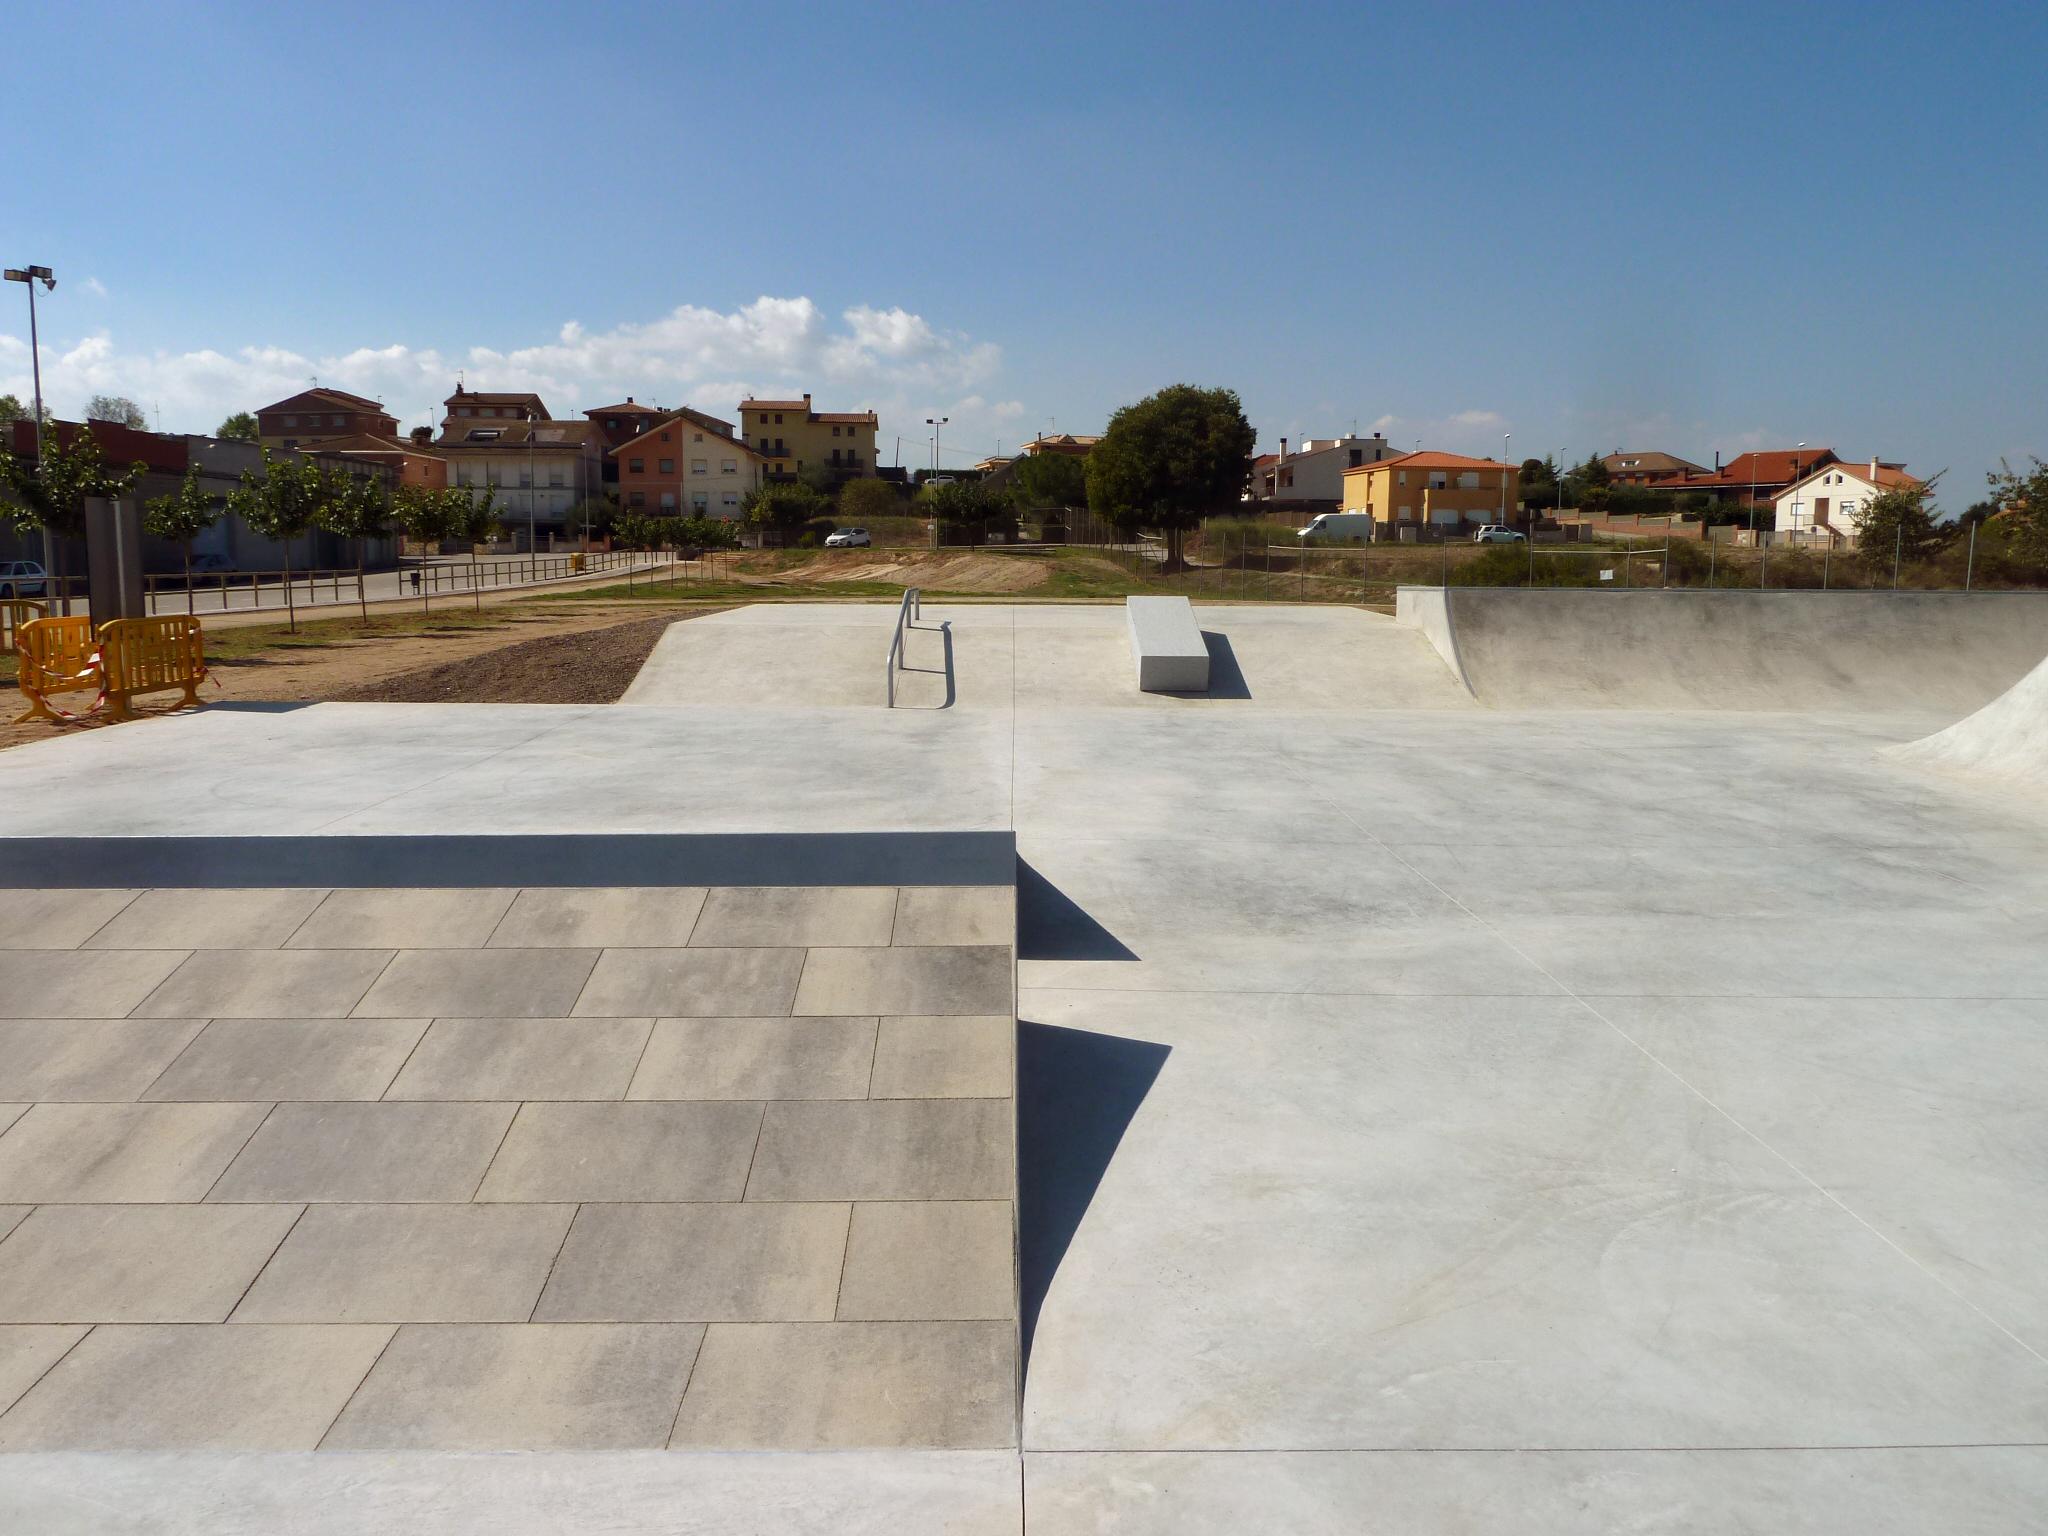 Skate-Architects-Navarcles-Skatepark-Skateplaza-06-AAP1120722.jpg